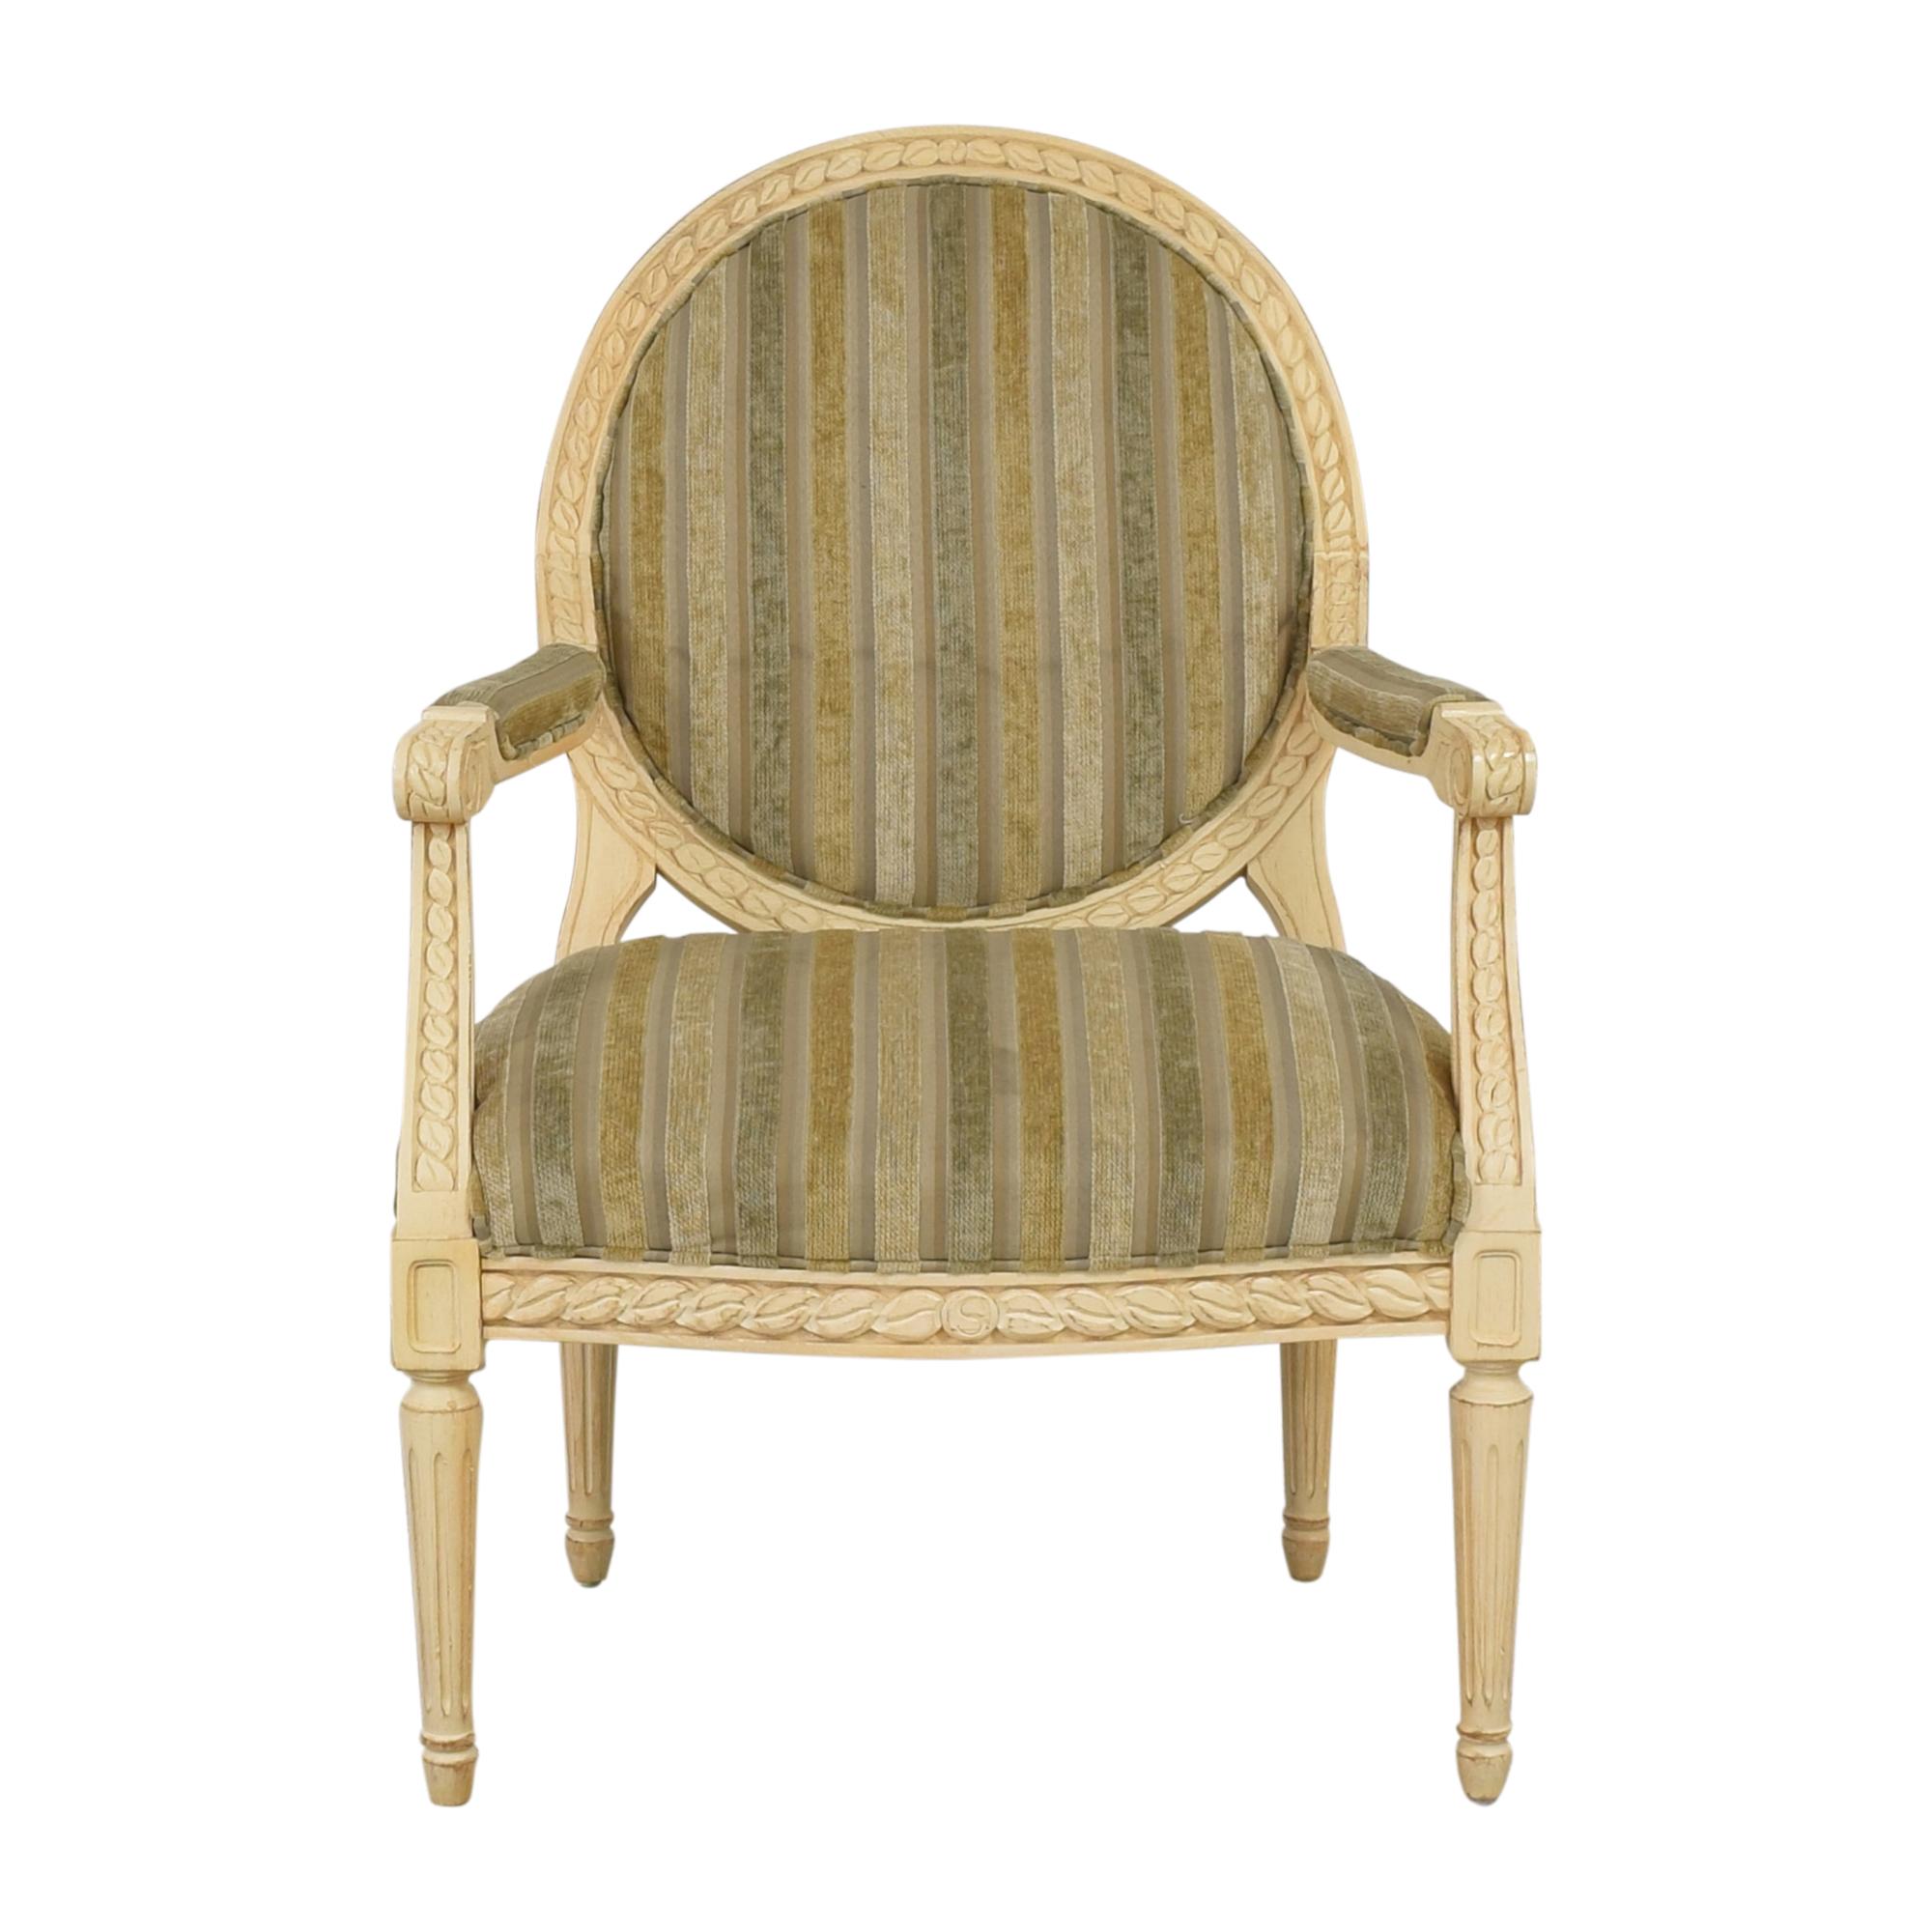 Fairfield Accent Chair / Chairs